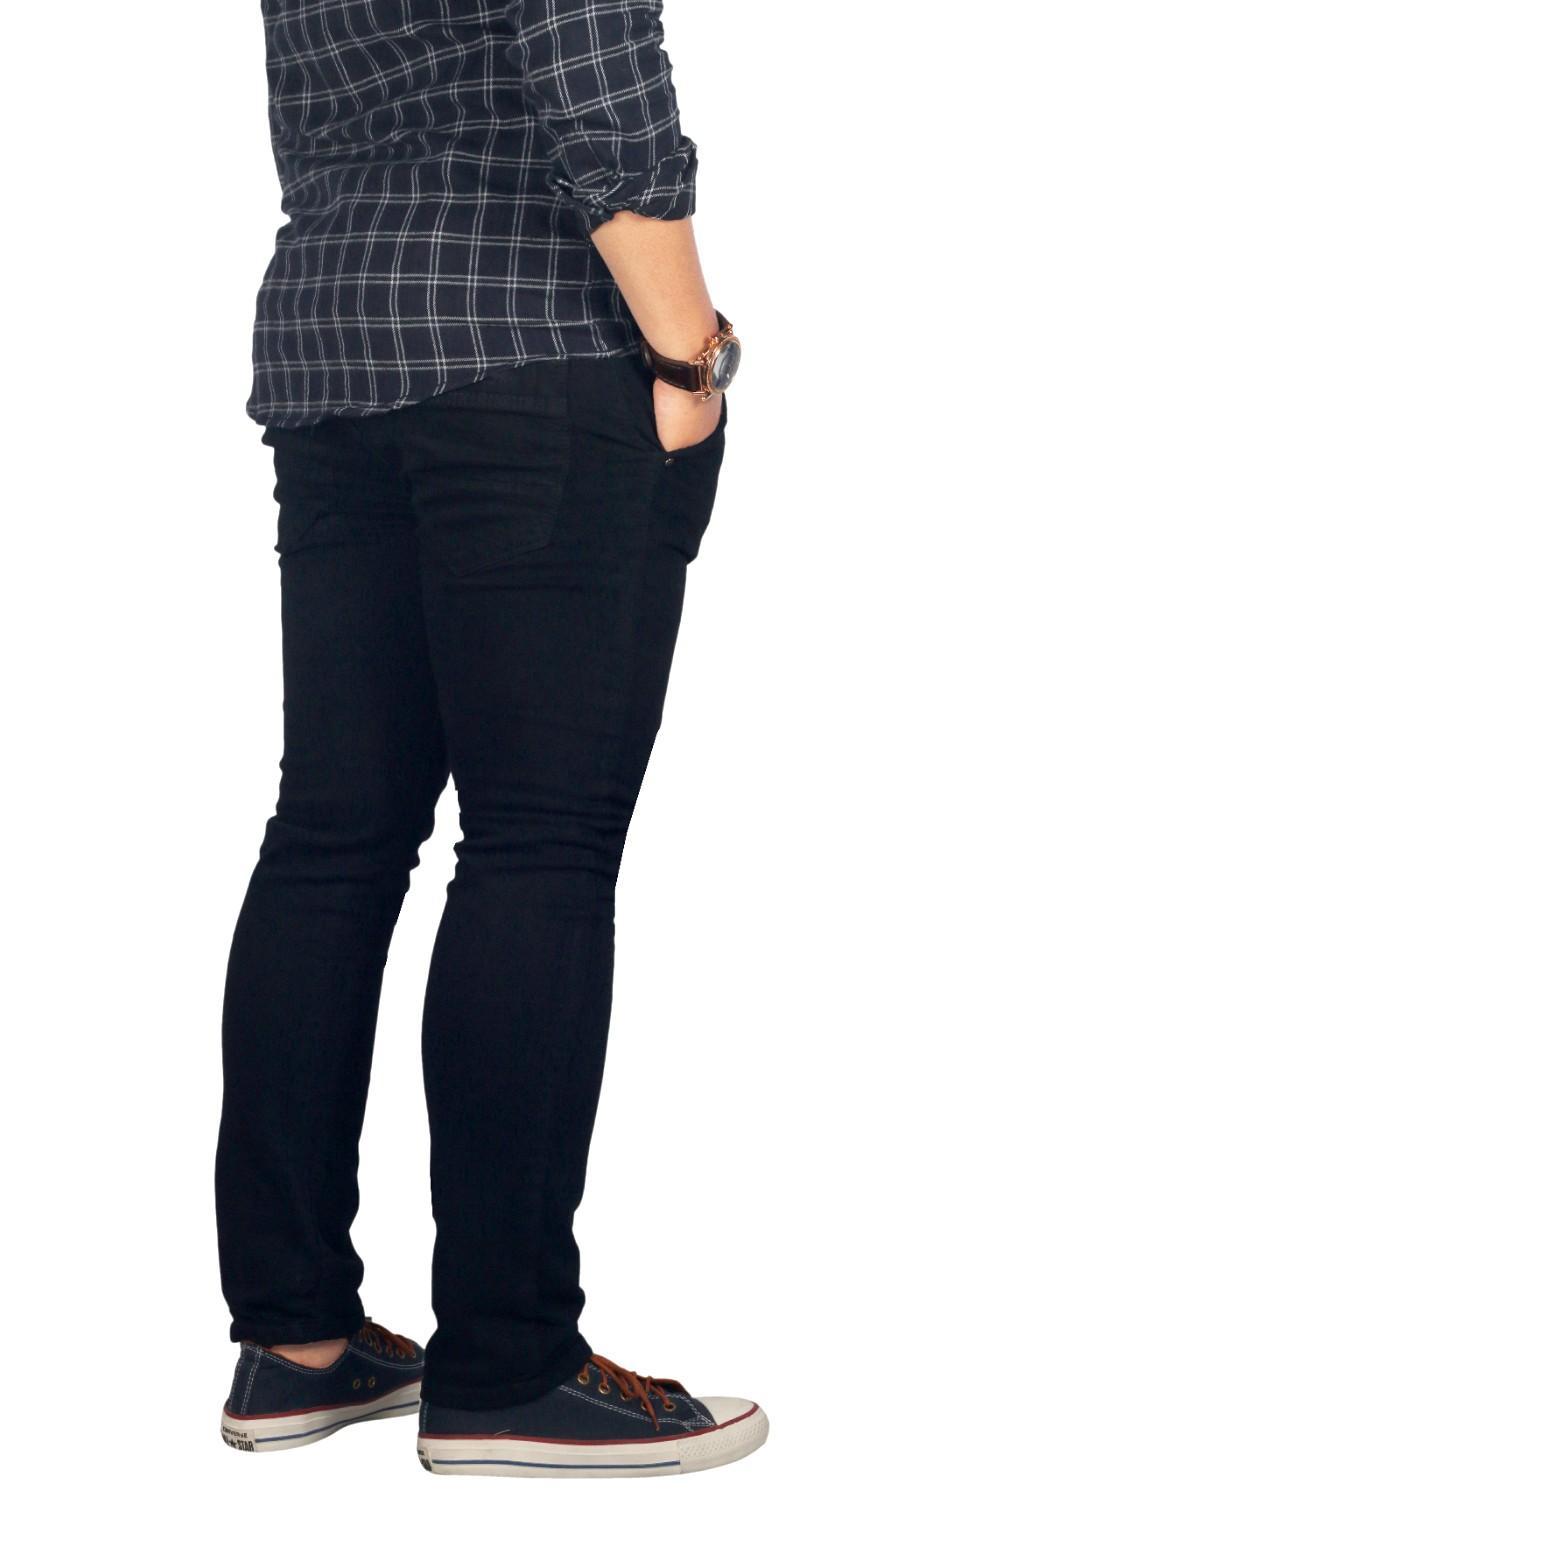 Cek Harga Baru Celana Jeans Cewek Hitam Skinny Terbaru Termurah Polos Bsg Fashion1 Panjang Soft Lepis Pria